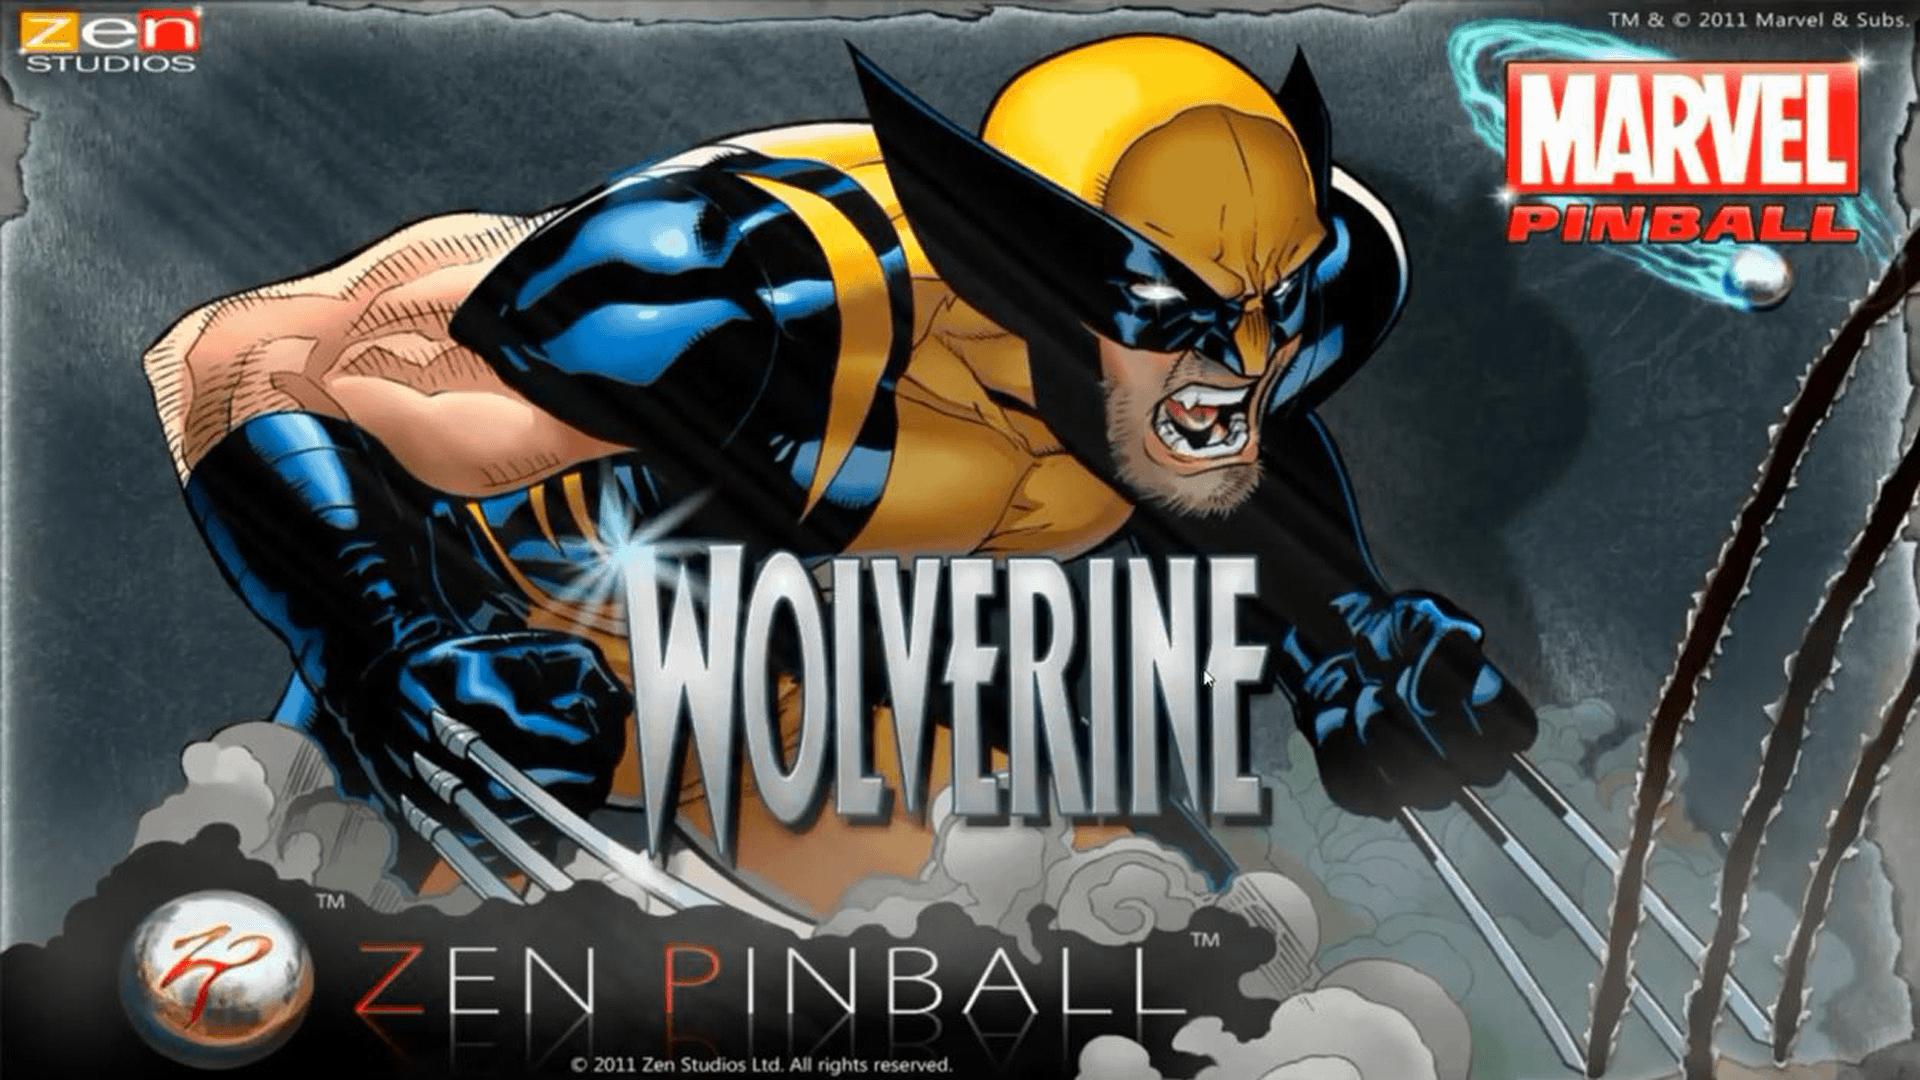 Marvel Pinball Original - Wolverine.png